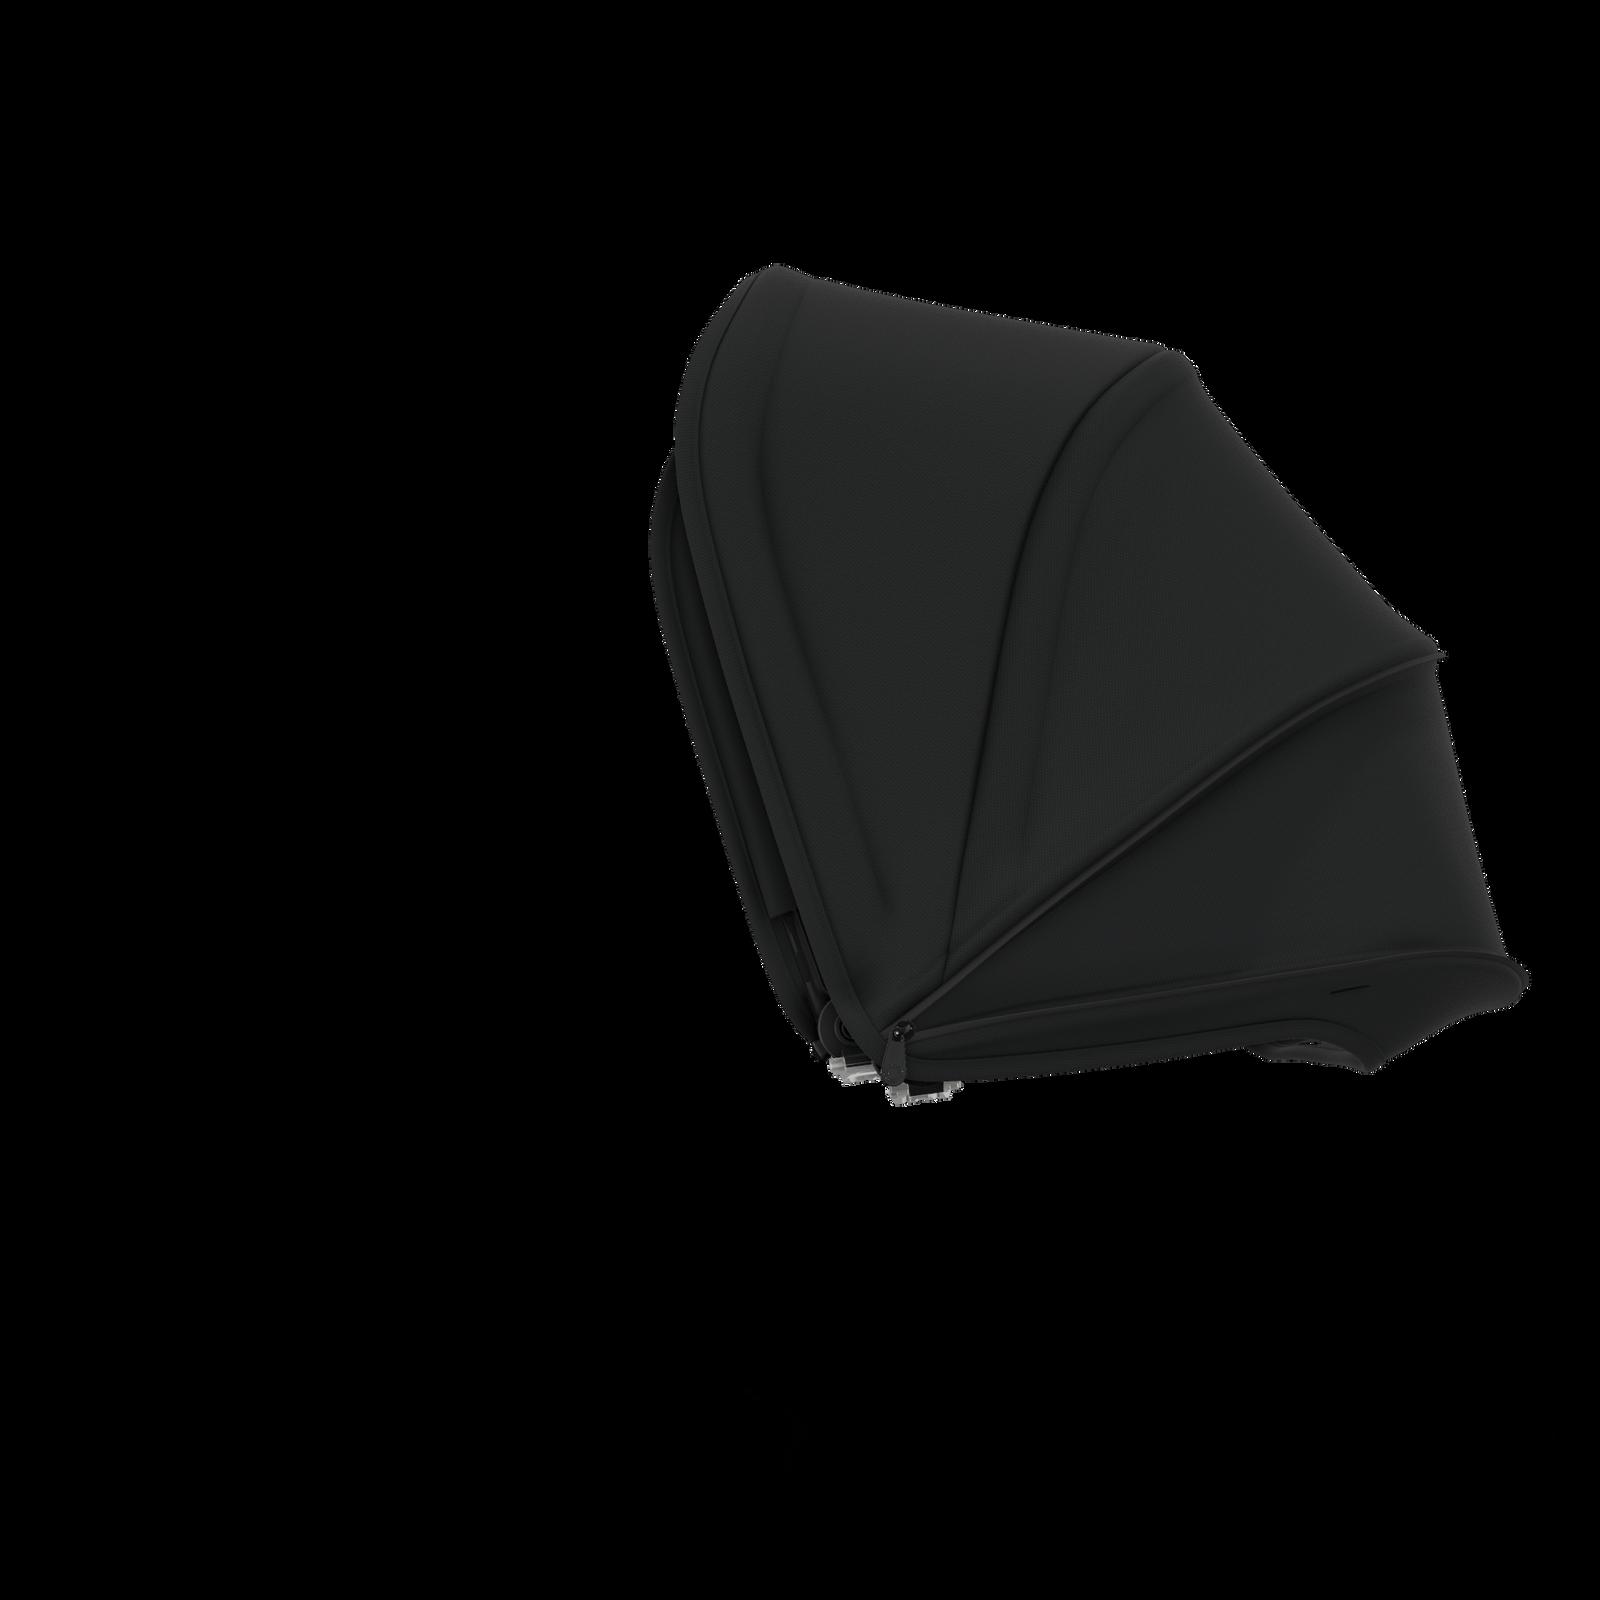 Bugaboo Bee5 sun canopy BLACK